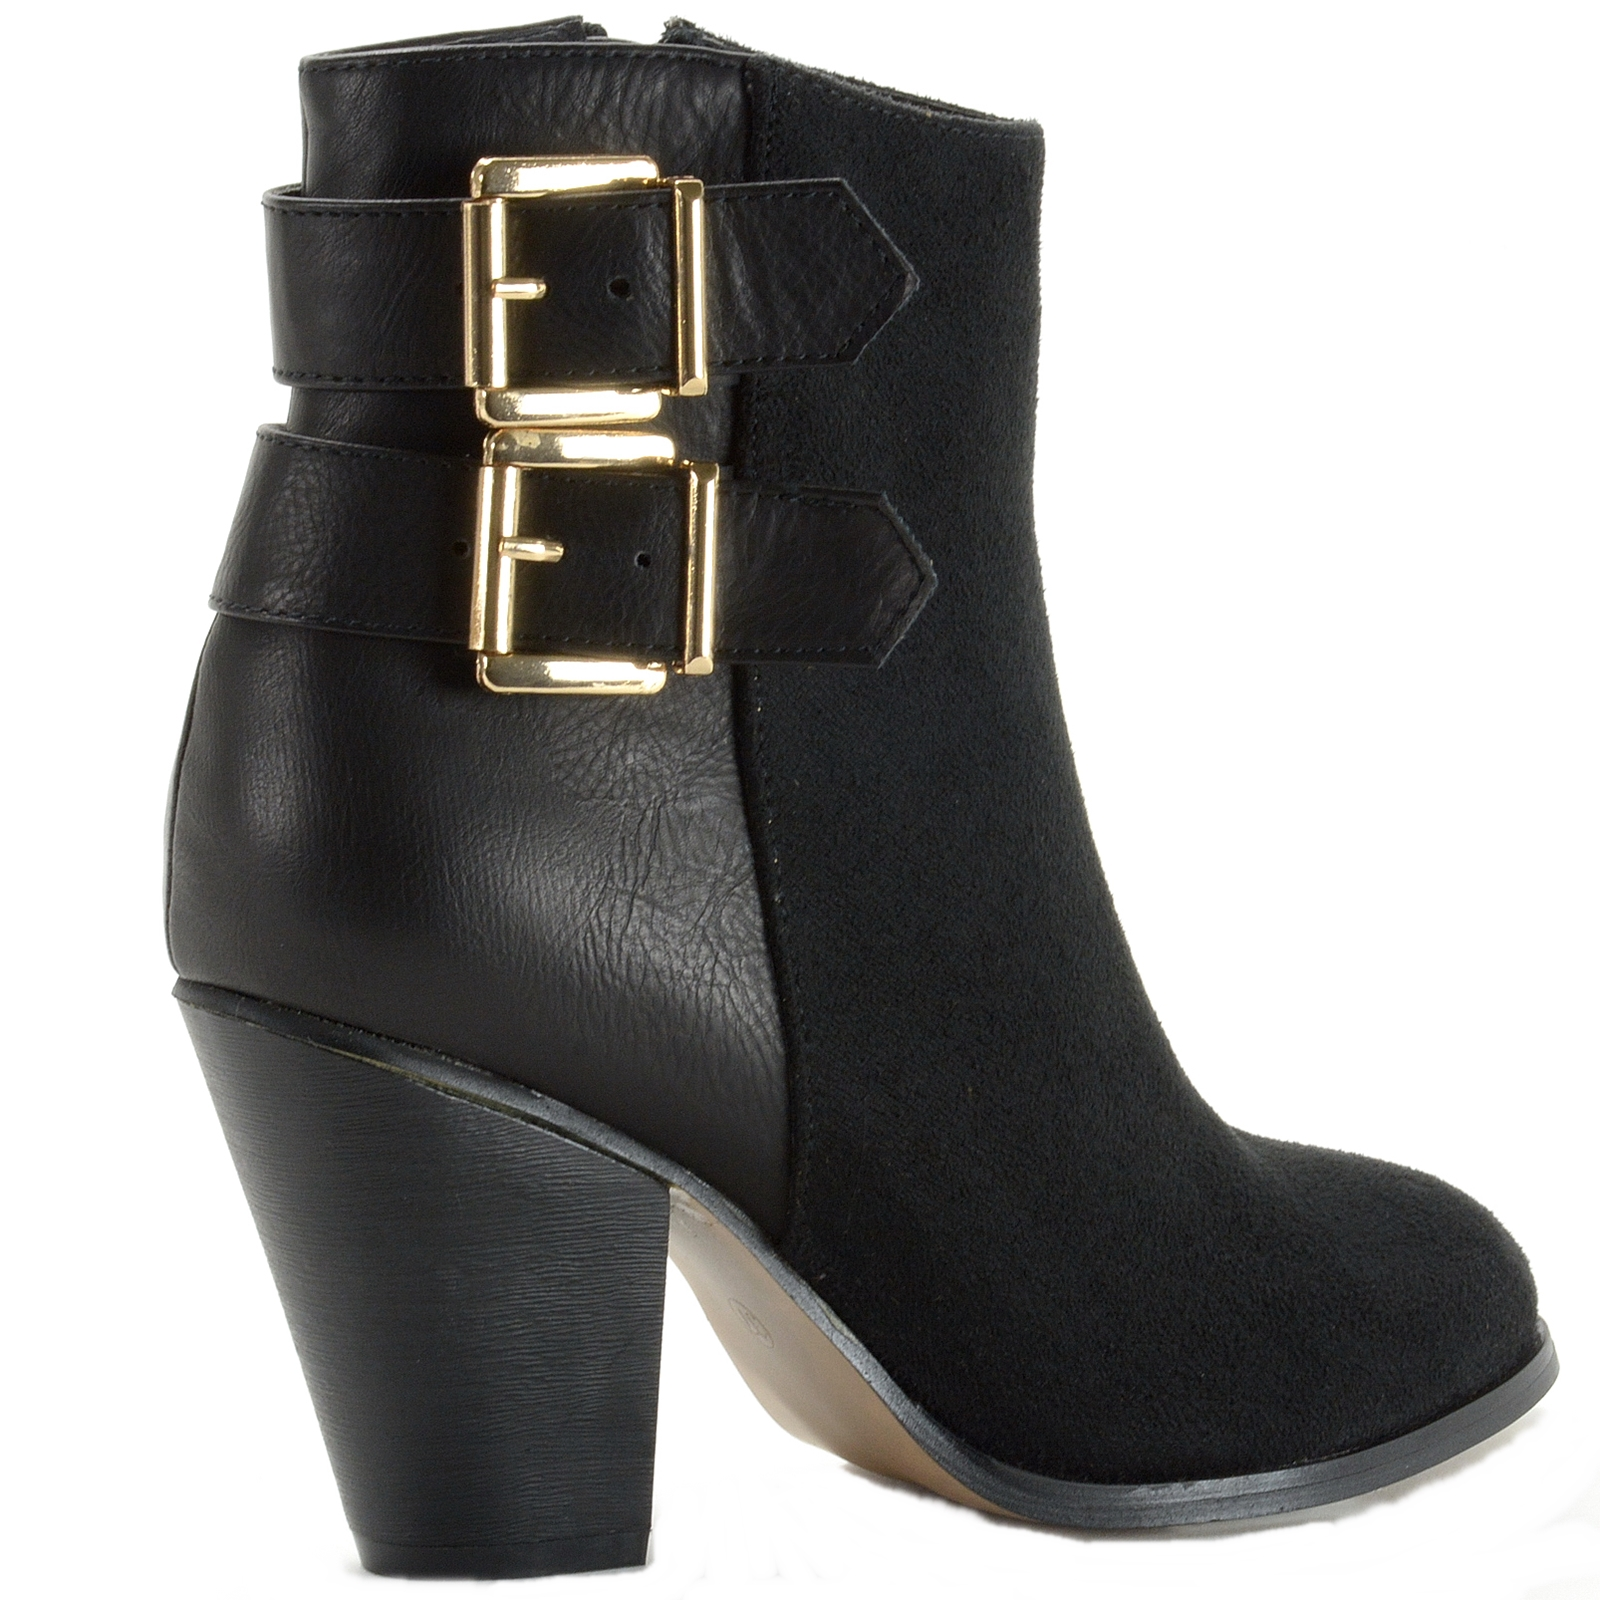 Alpine-Swiss-Nendaz-Women-039-s-Ankle-Boots-Tailored-3-034-Block-High-Heel-Ankle-Bootie